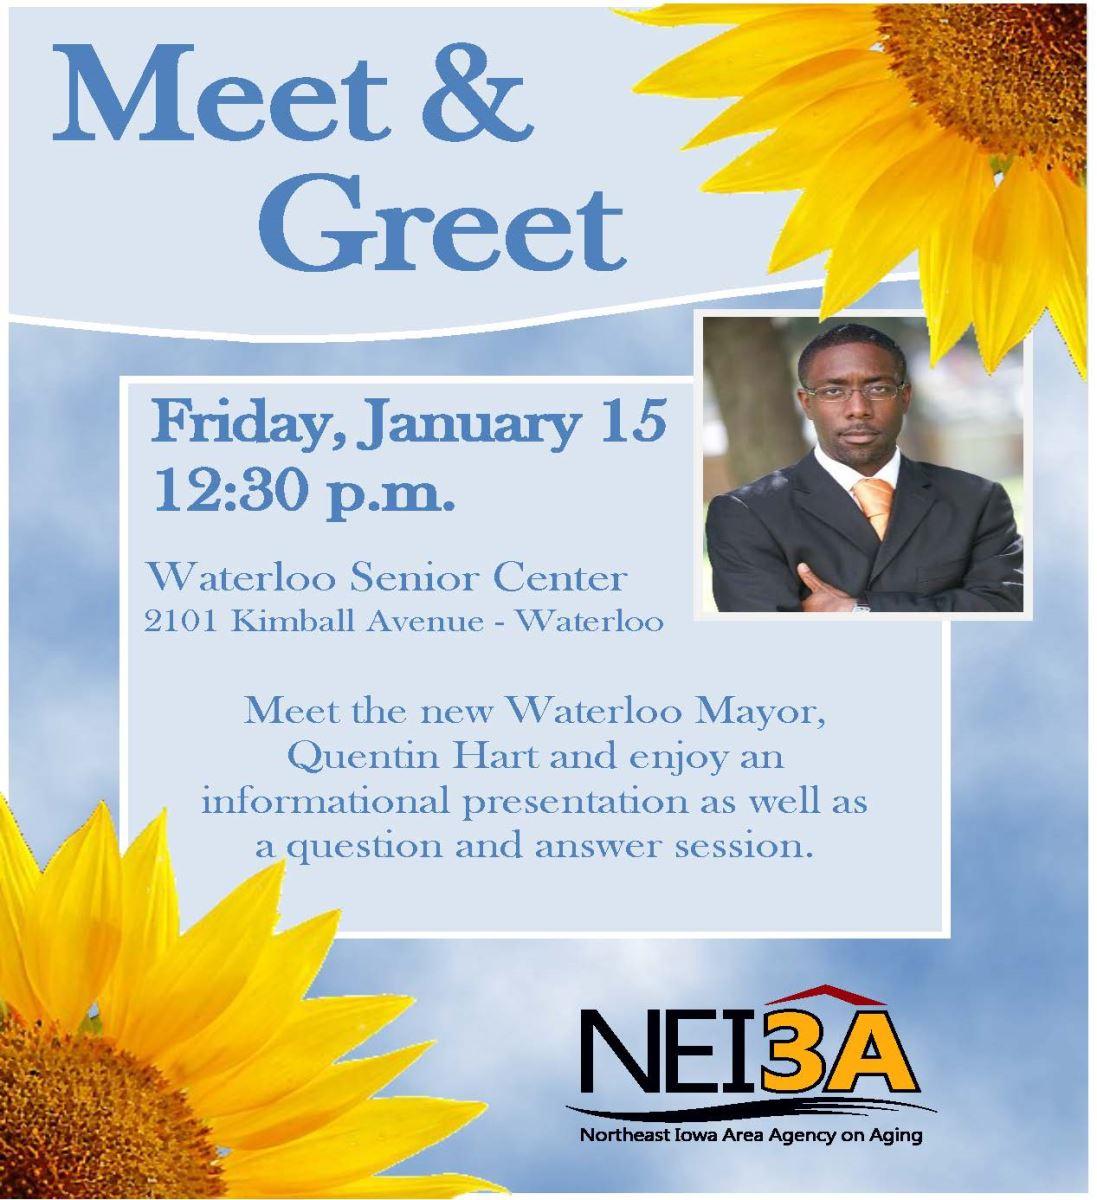 Waterloo Mayor Meet And Greet Northeast Iowa Area Agency On Aging